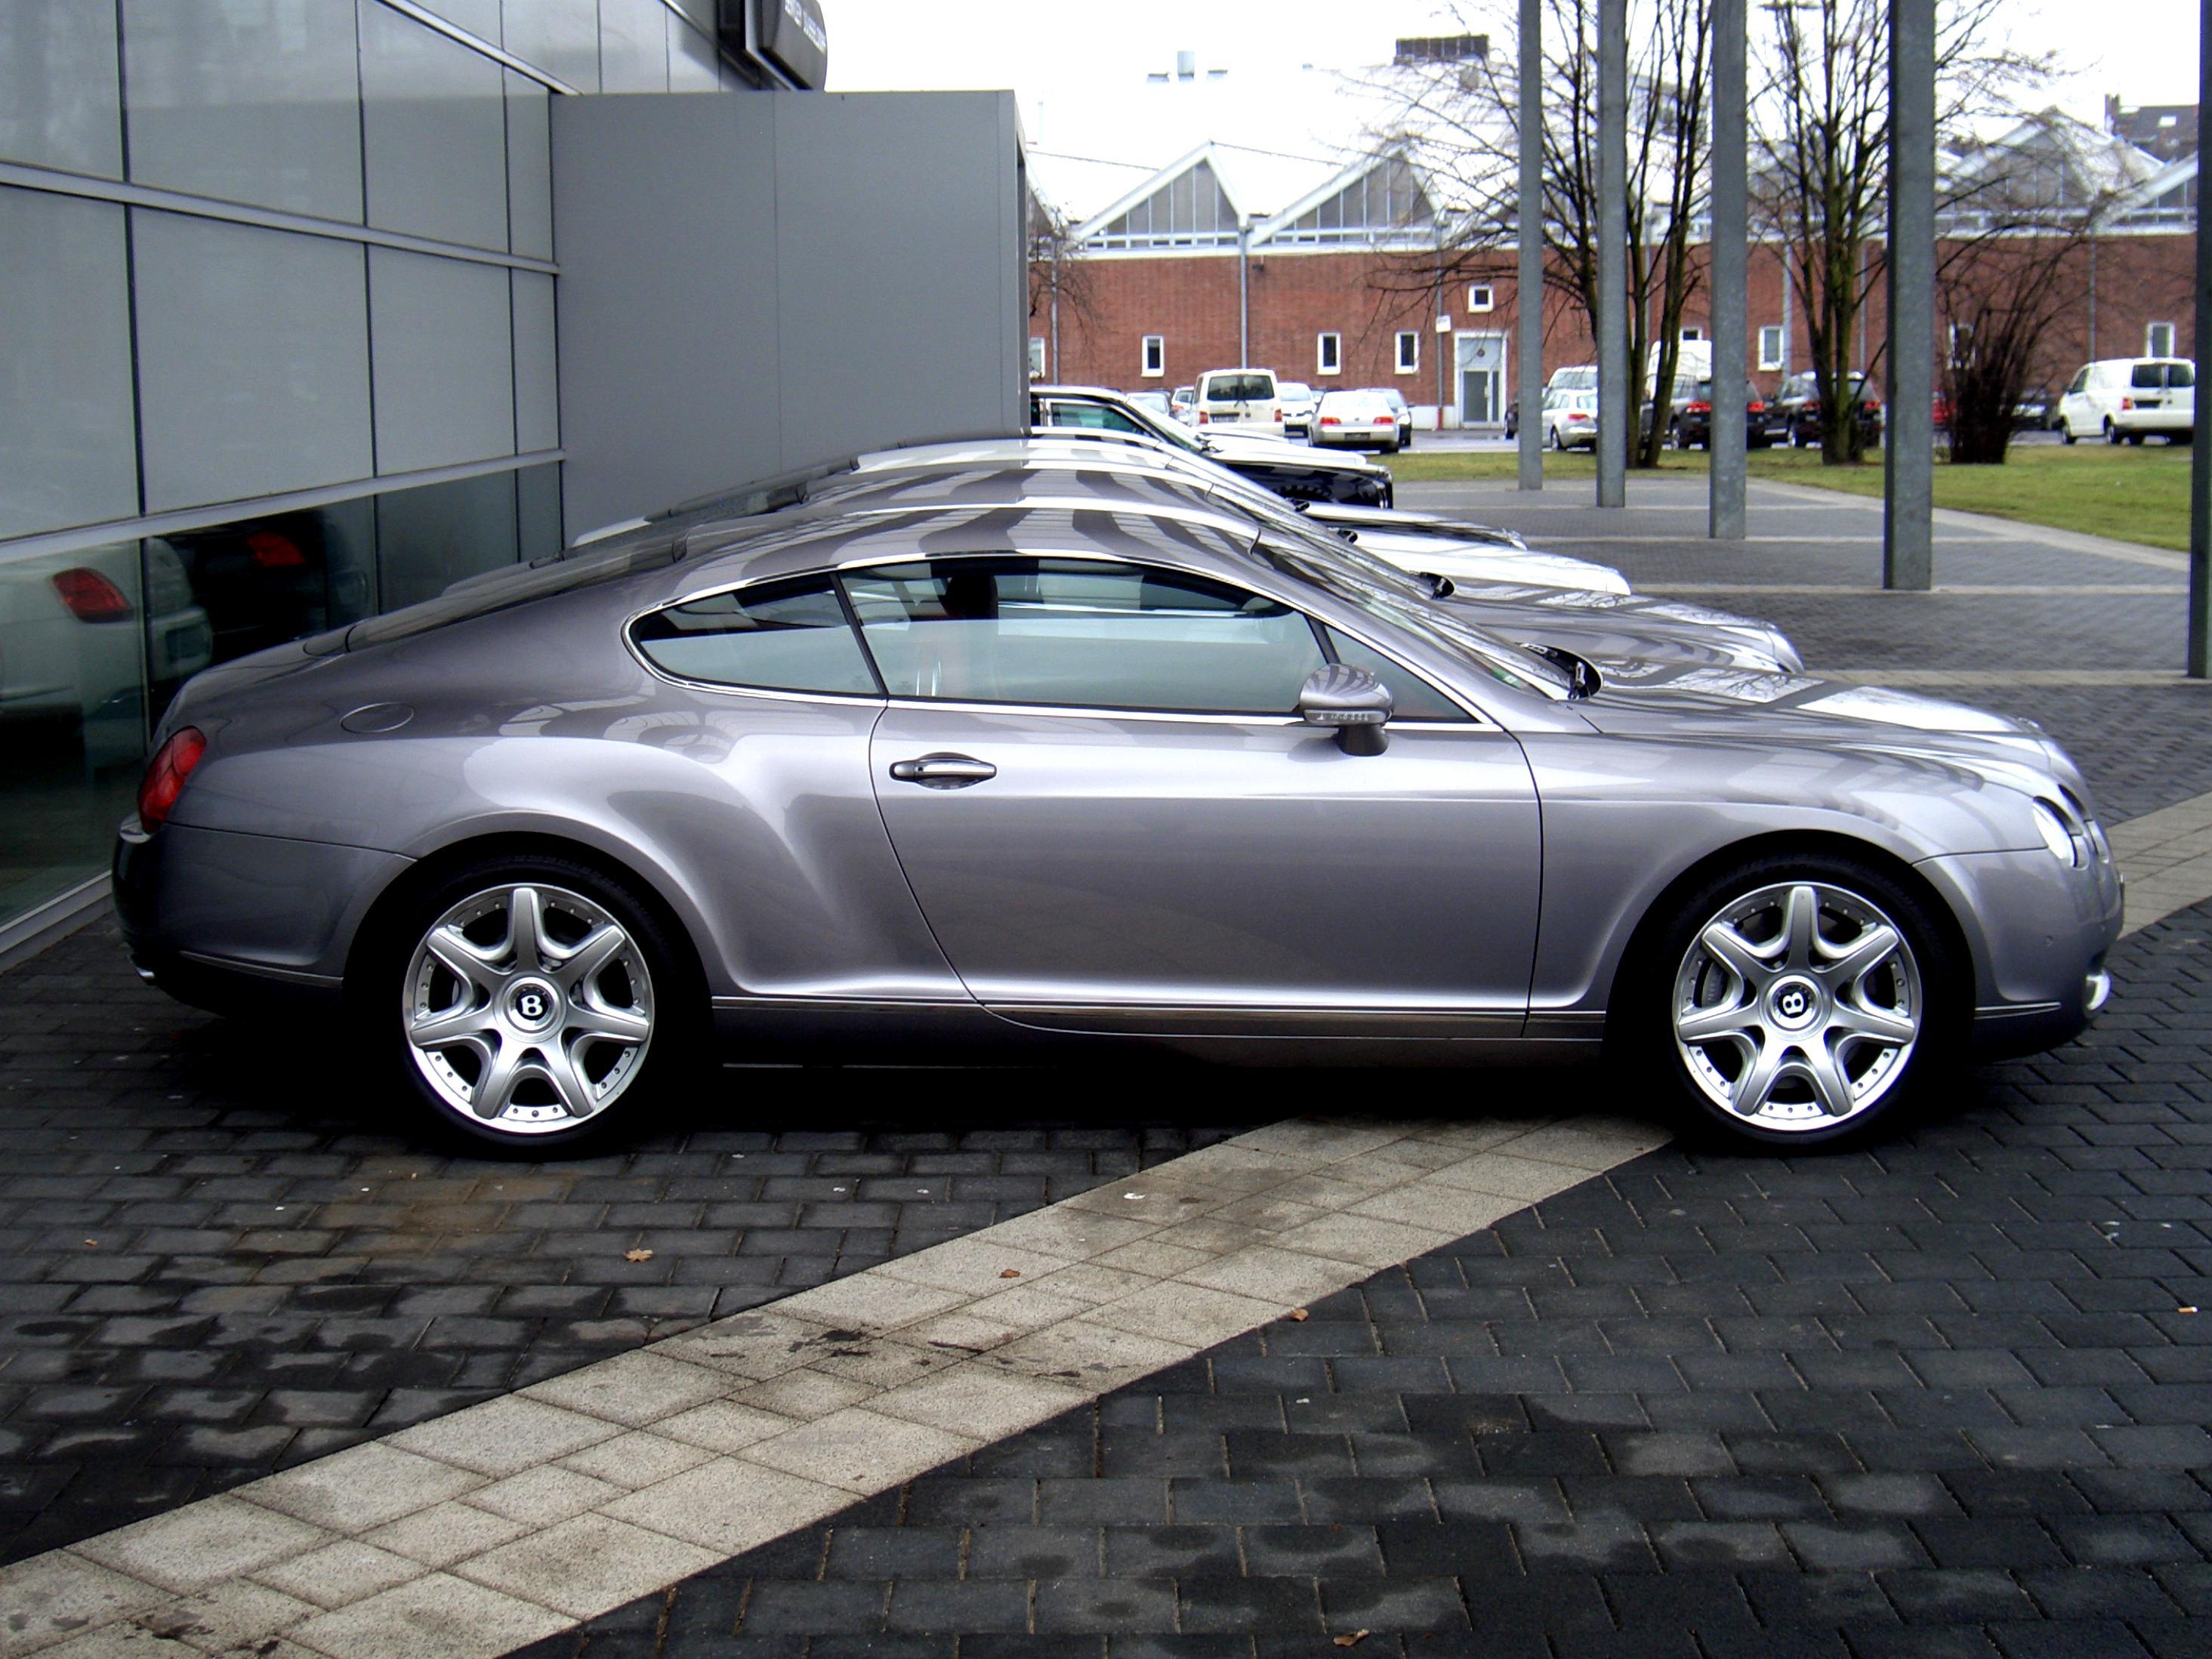 Bentley continental gt 2003 on motoimg bentley continental gt 2003 2 vanachro Gallery